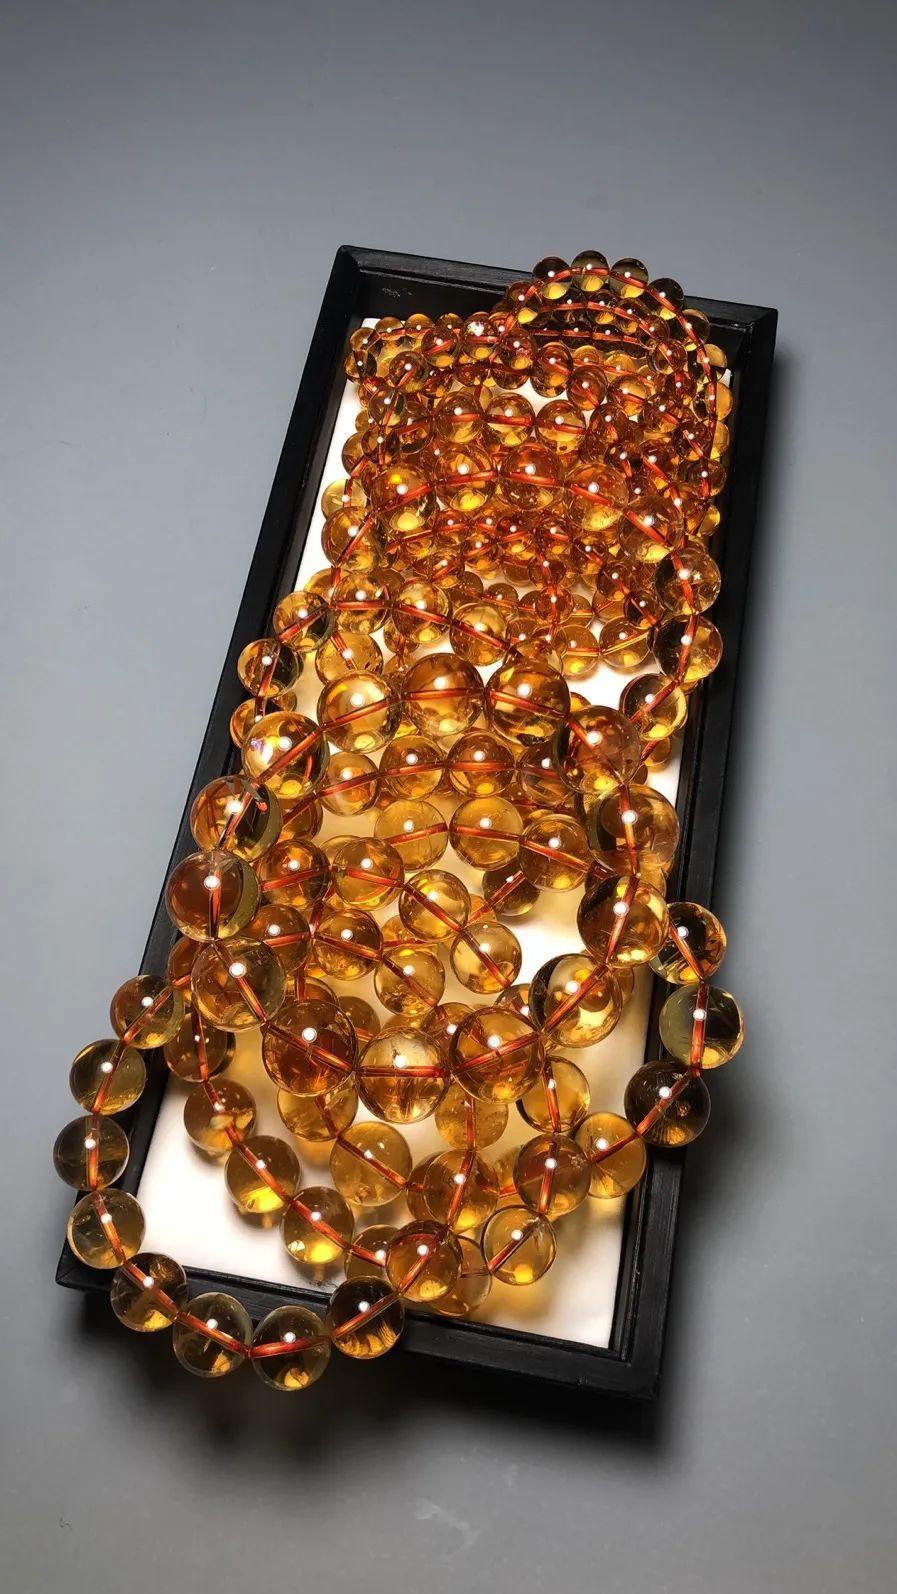 resize,m fill,h 1594,w 897 - 如何挑选水晶,怎样区分水晶品质好坏?